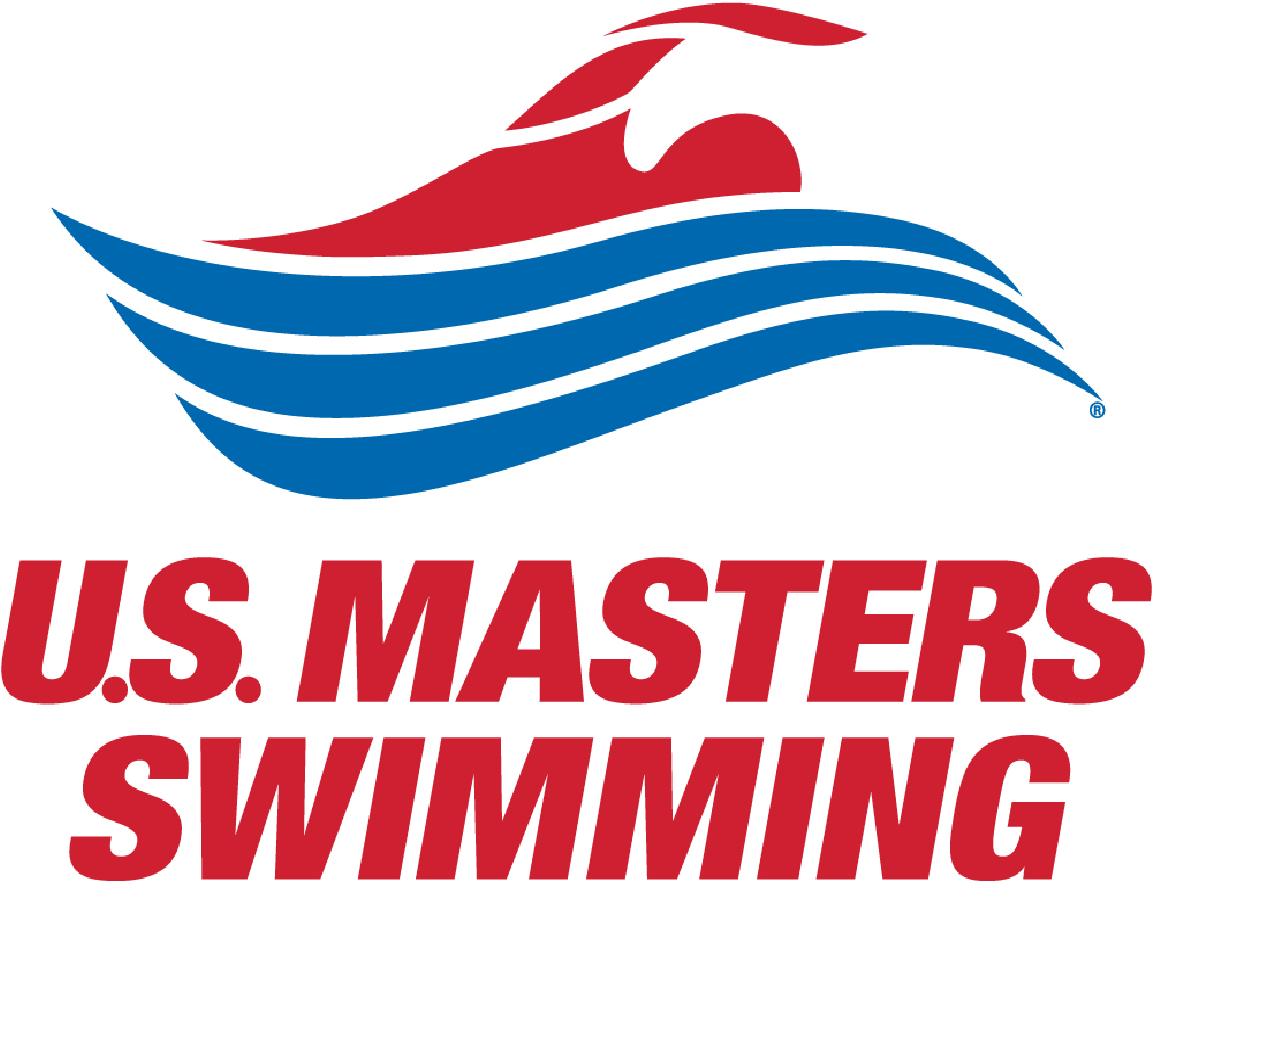 U.S. Masters Swimming